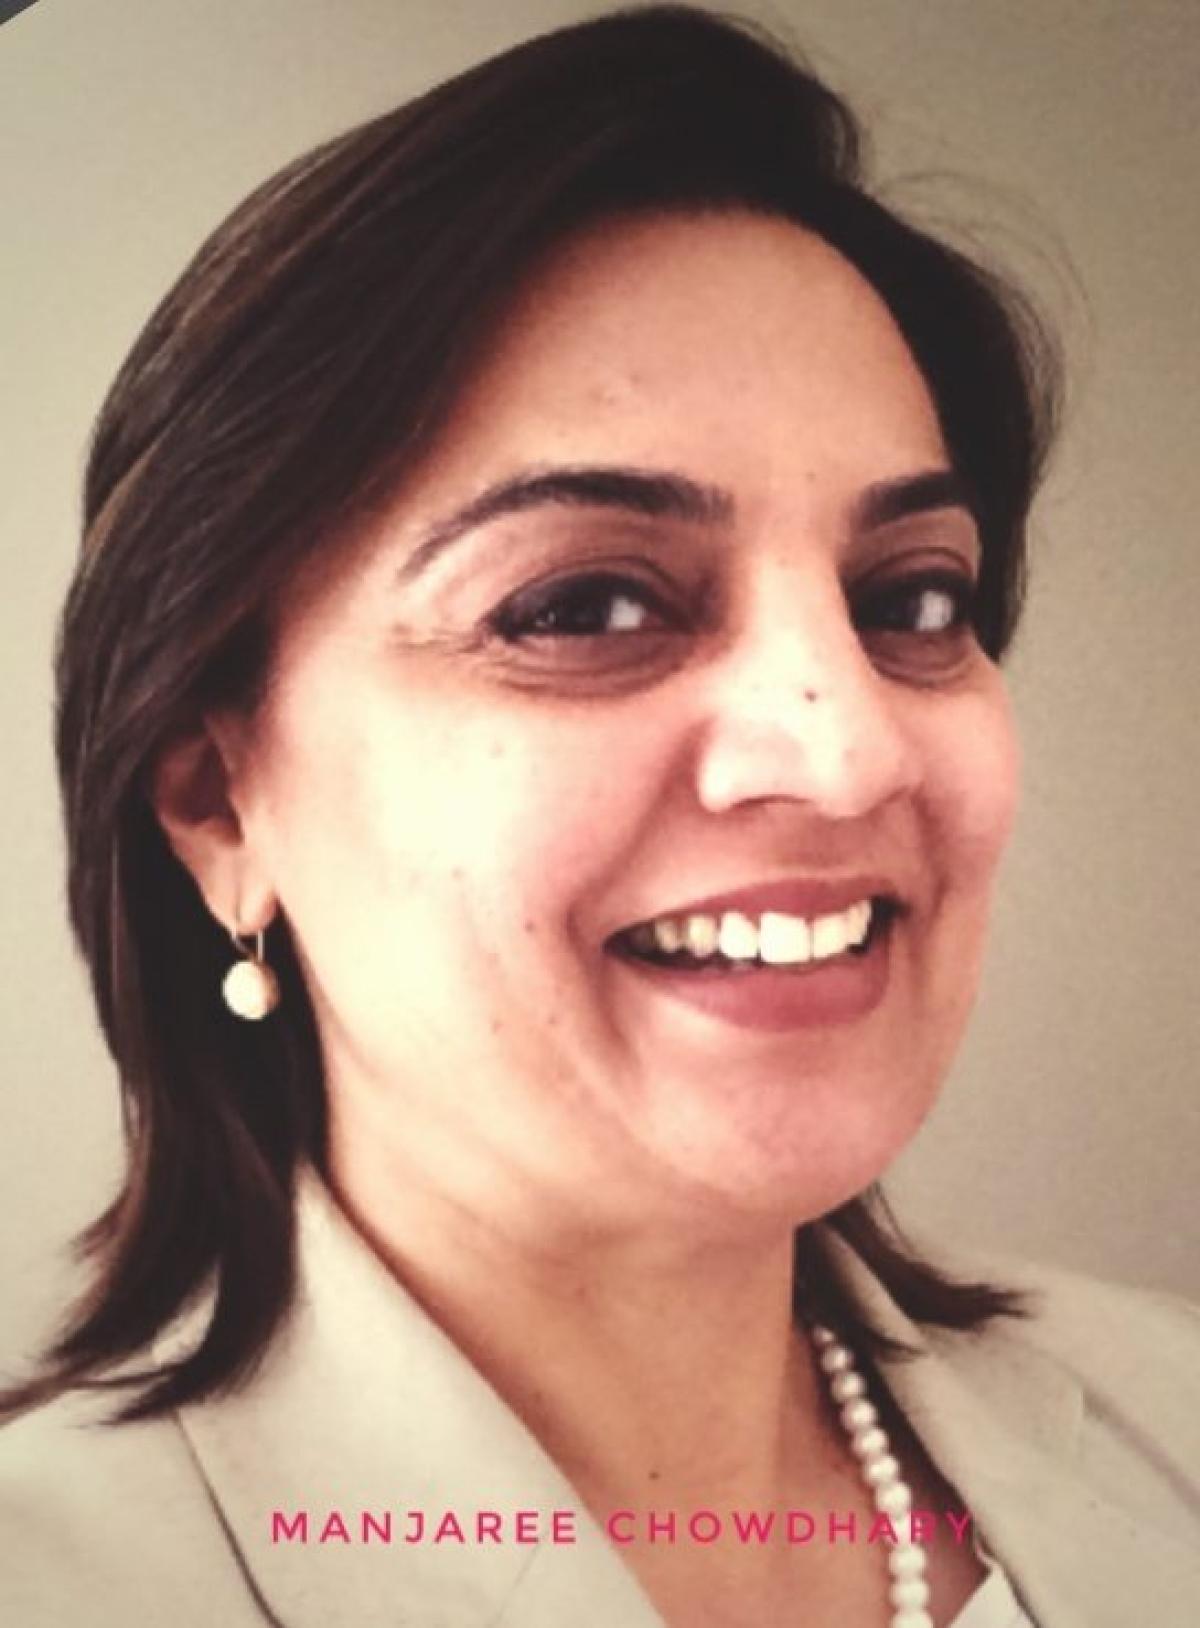 Maruti Suzuki gets its first woman General Counsel, Manjaree Chowdhary